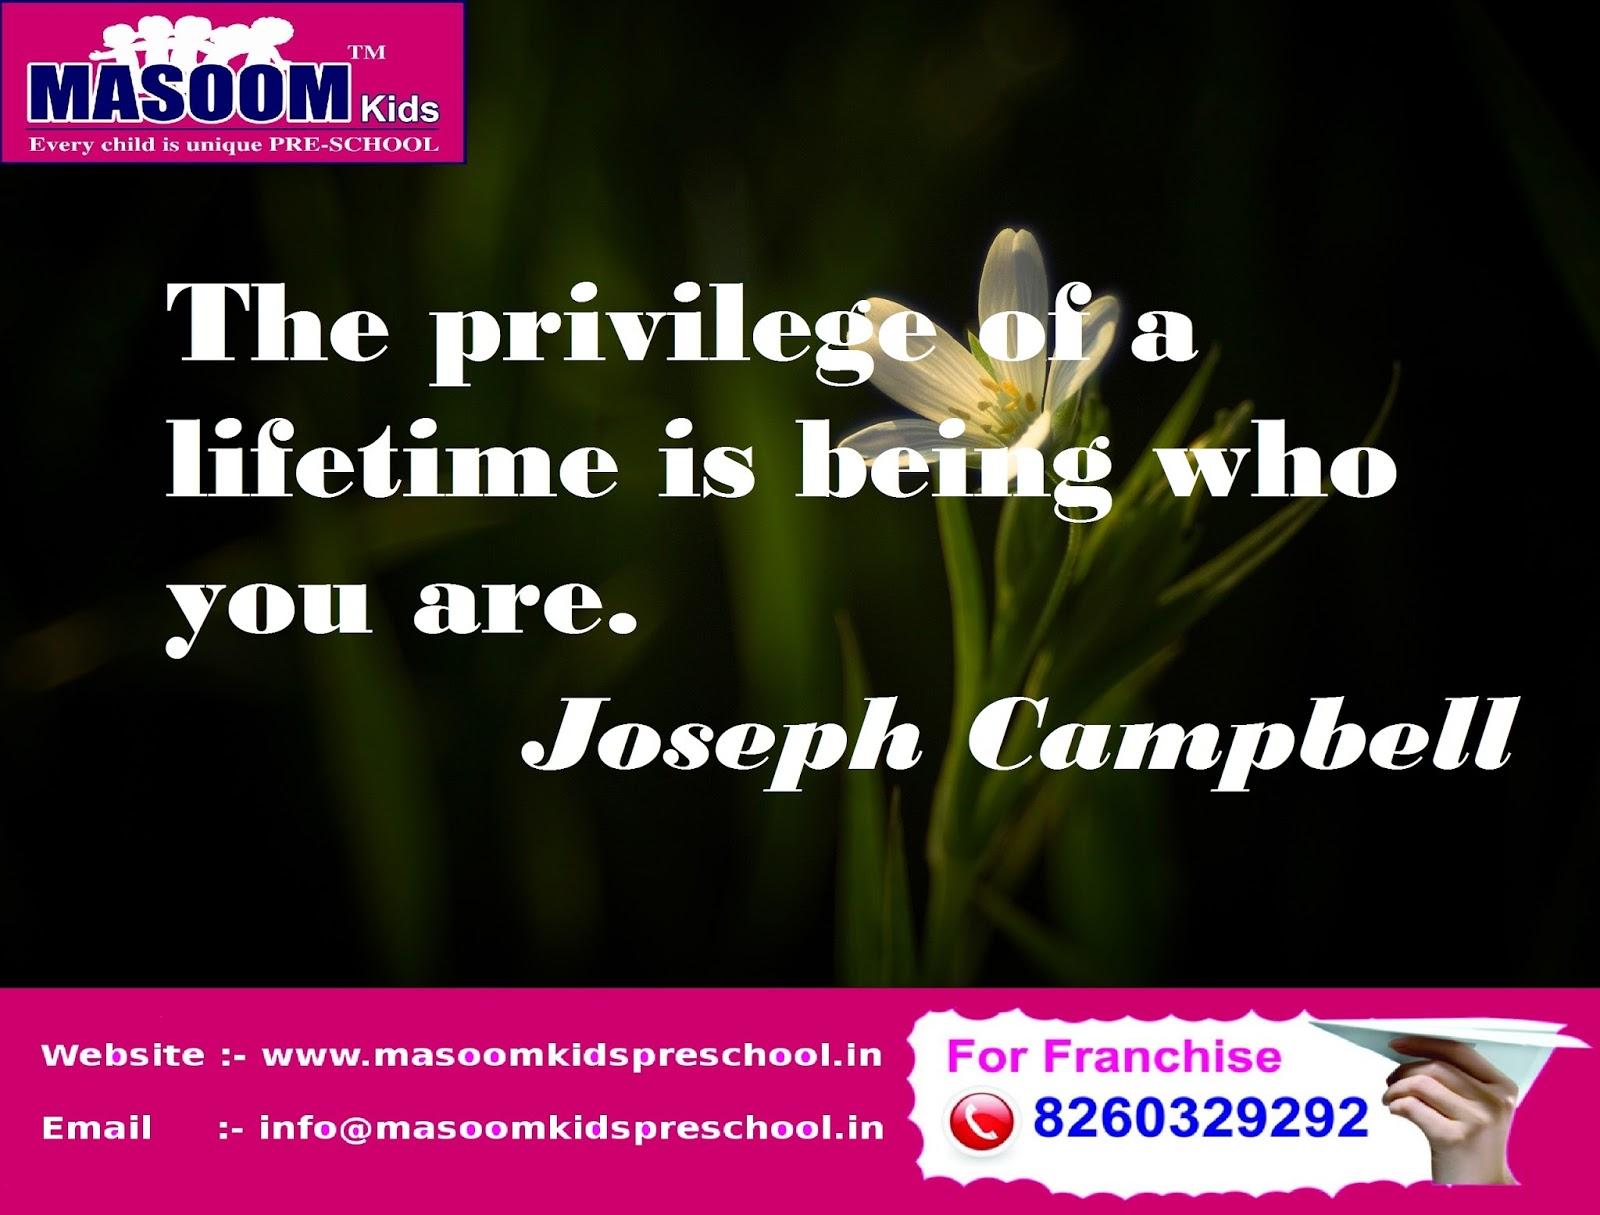 Masoom Kids Pre School Educational Quotes